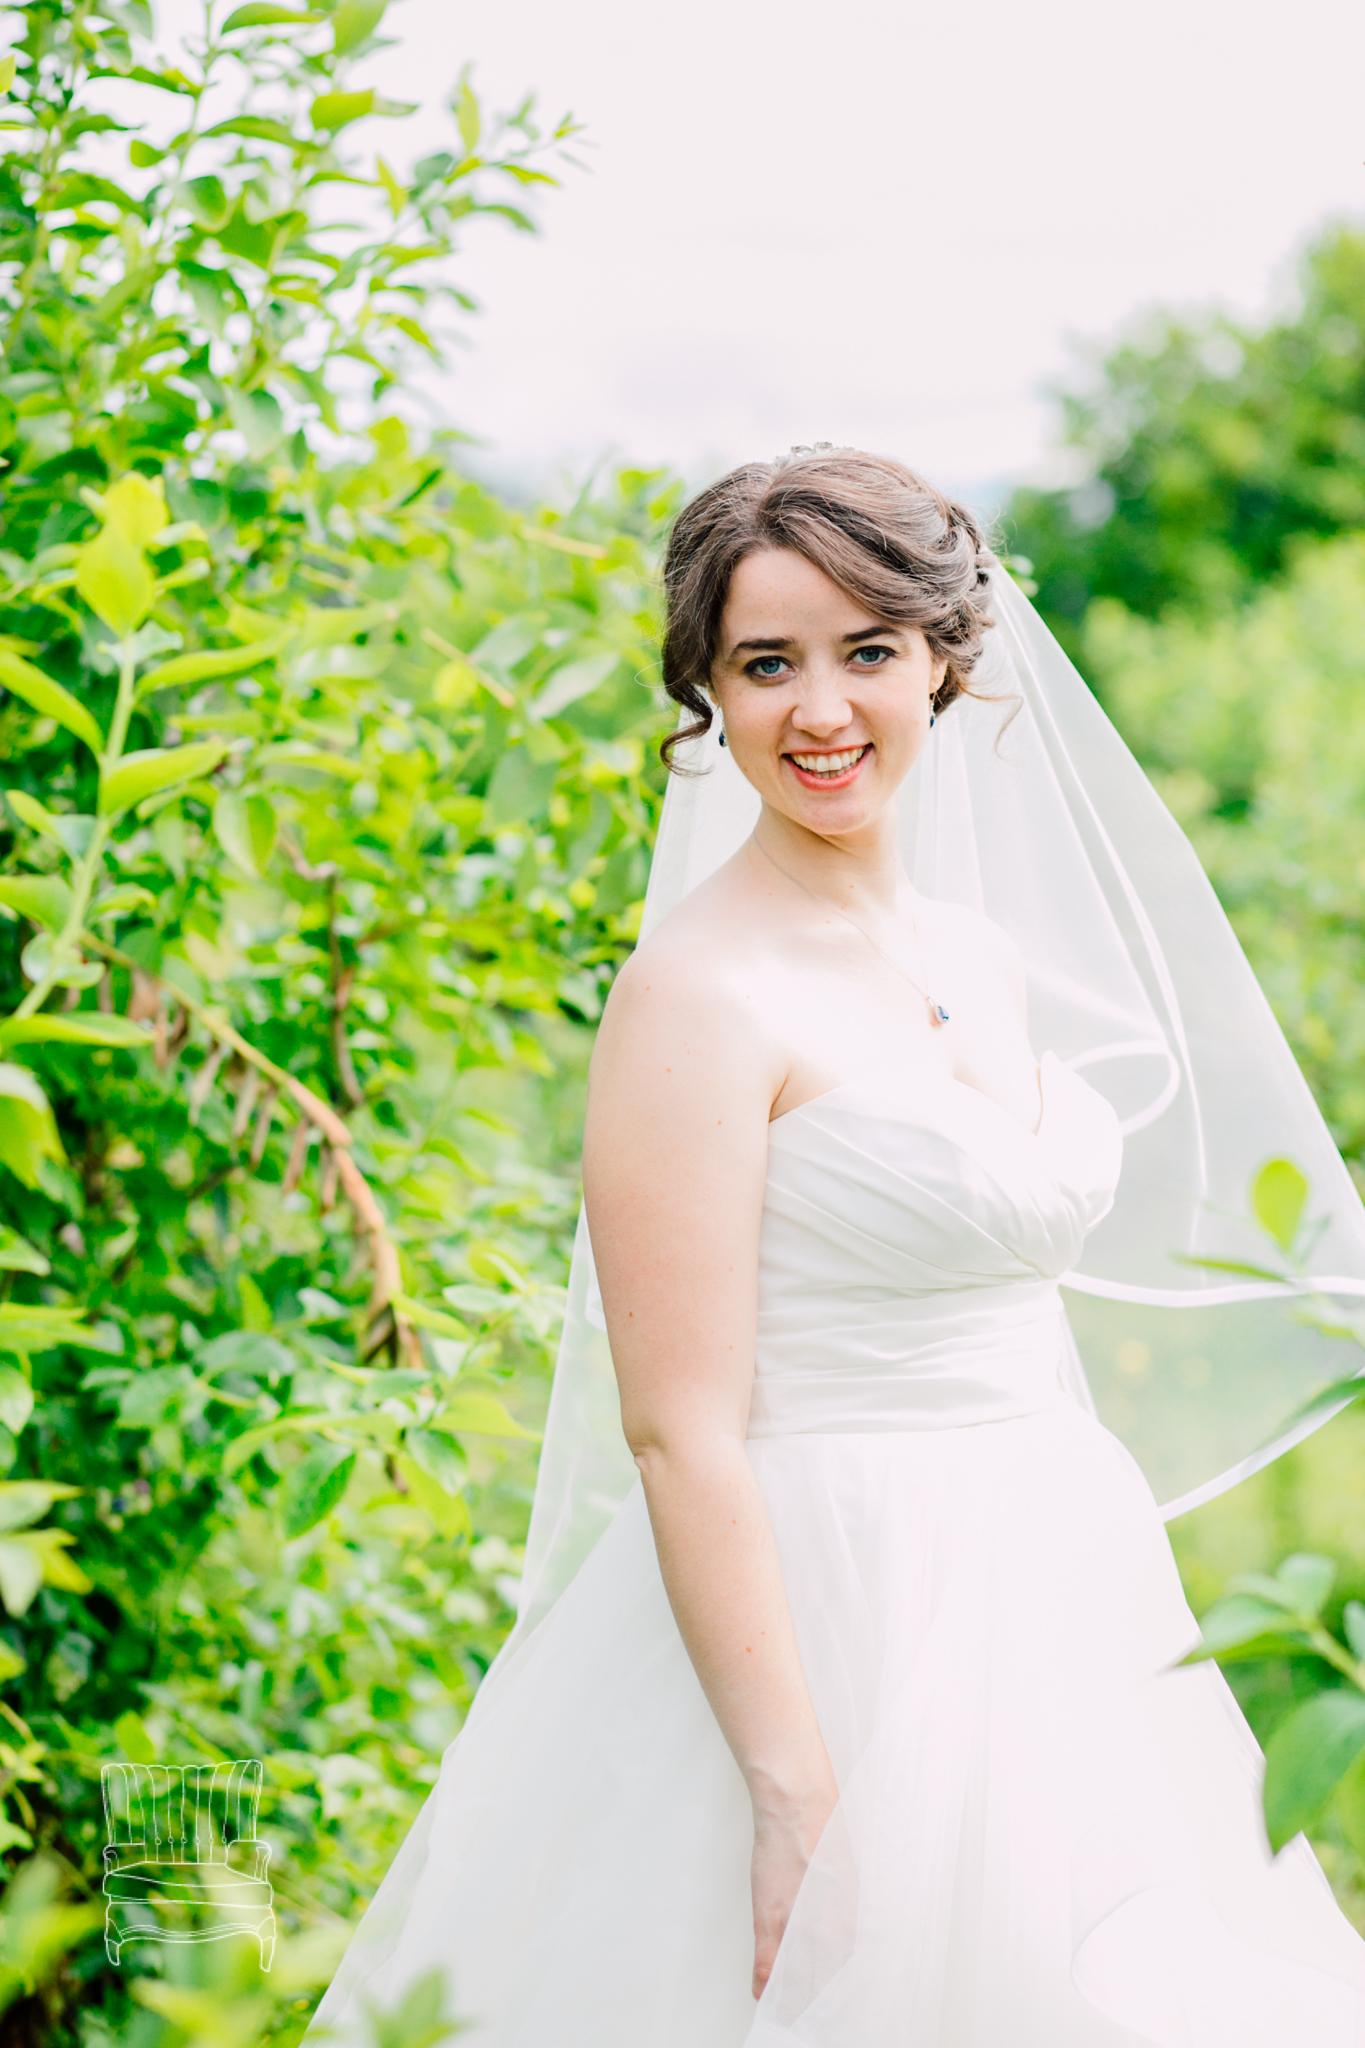 bybee-farms-north-bend-washington-wedding-allison-jon-36.jpg